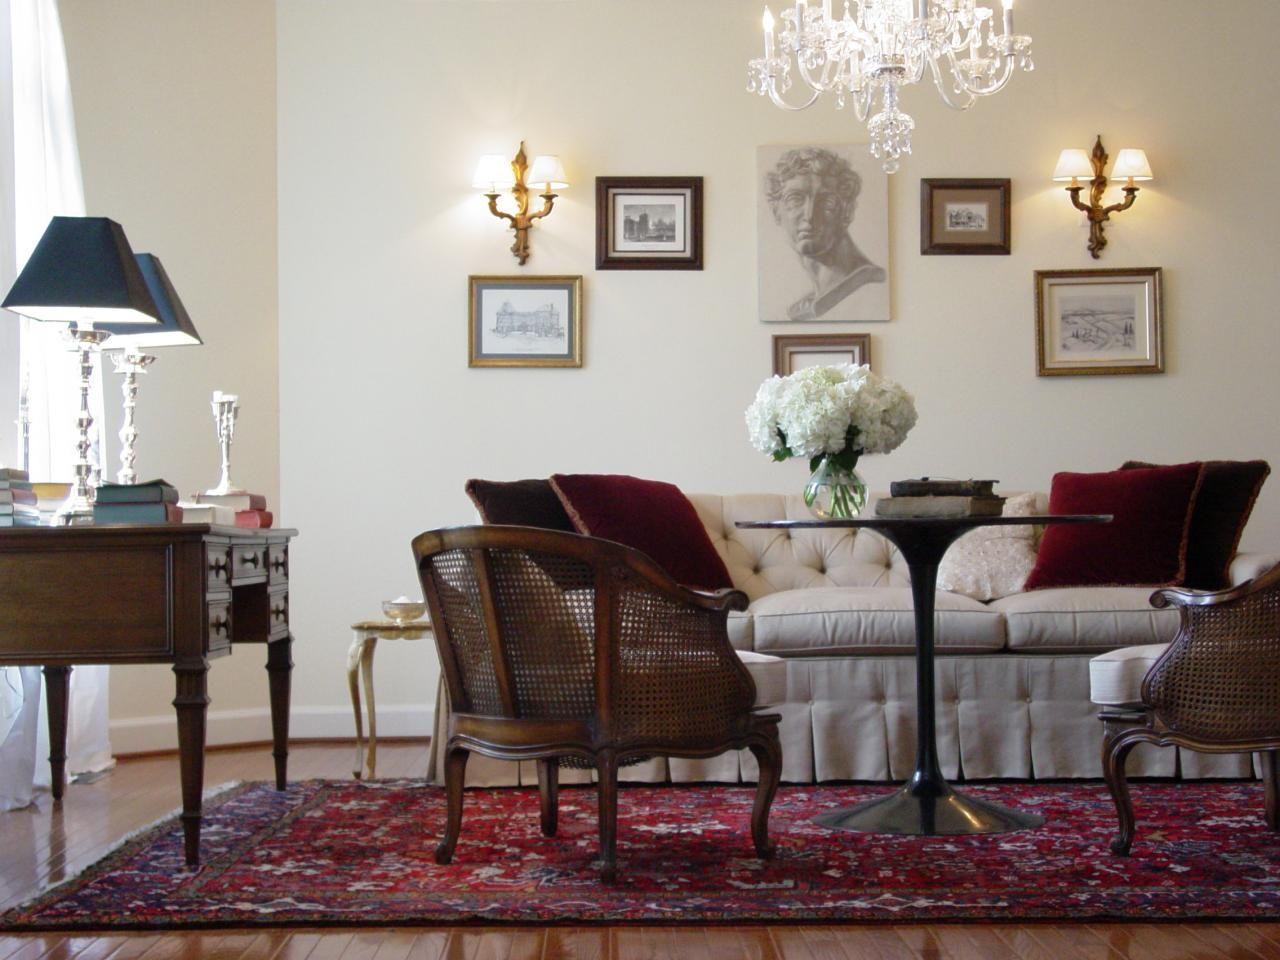 Vintage Lakberendezés  Vintage Bútorok  Pinterest  Traditional Adorable Living Room Dining Room Layout Ideas Decorating Inspiration